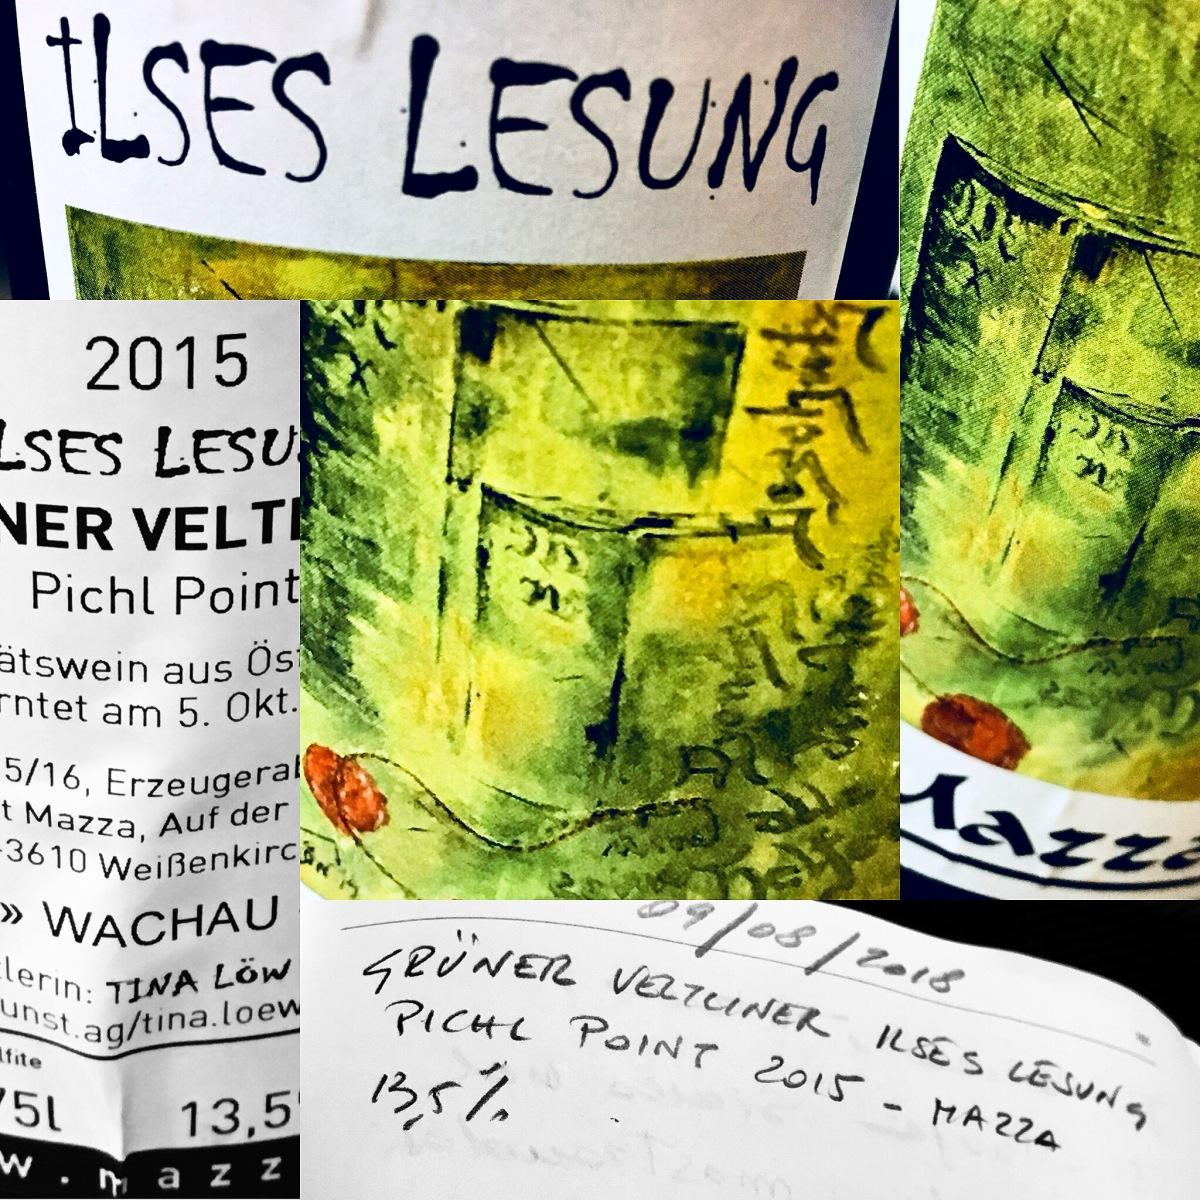 GRÜNER VELTLINER ILSES LESUNG PICHL POINT 2015 - WEINGUT MAZZA